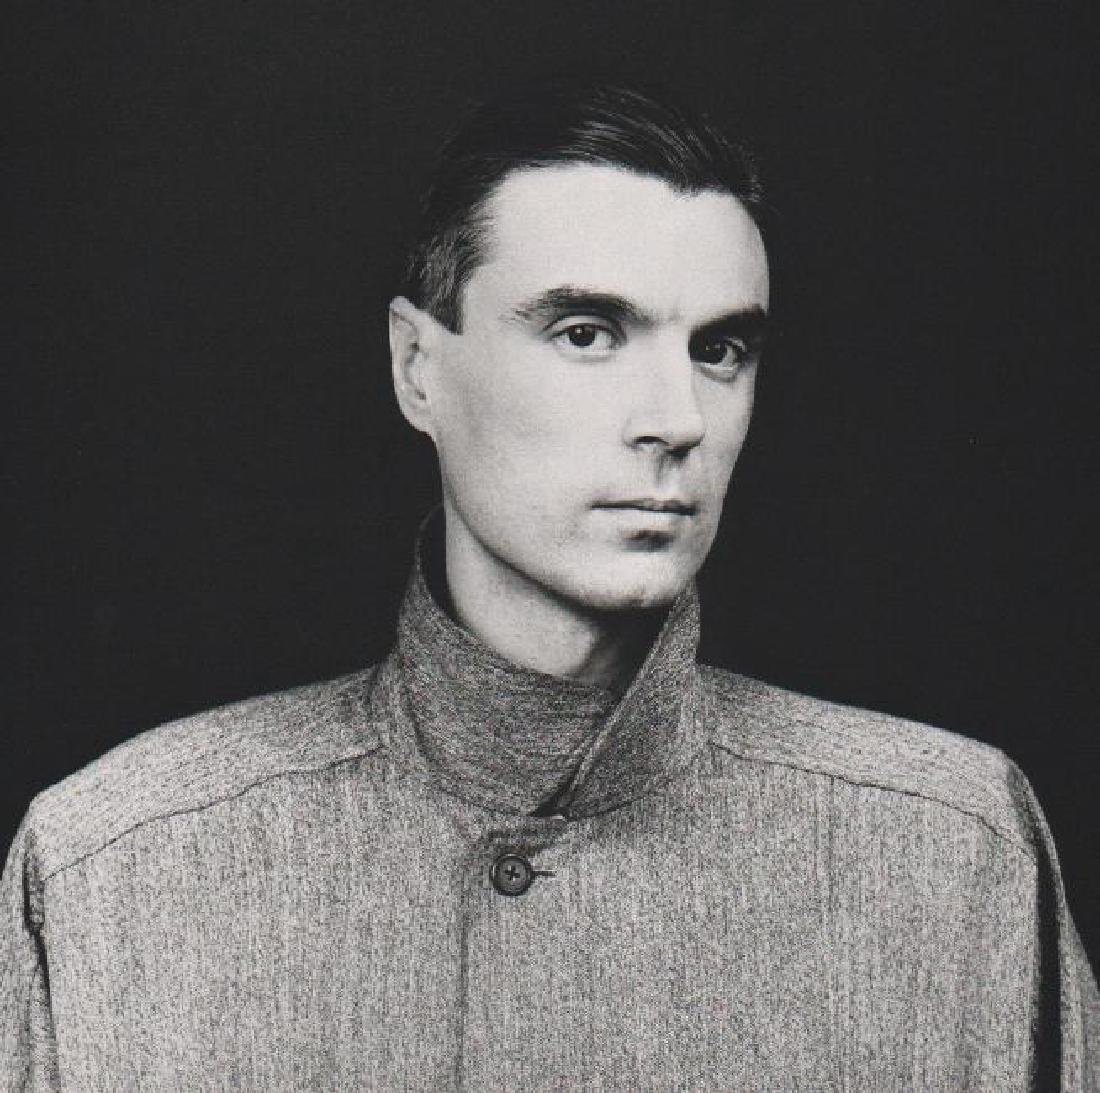 MAPPLETHORPE - David Byrne, 1983